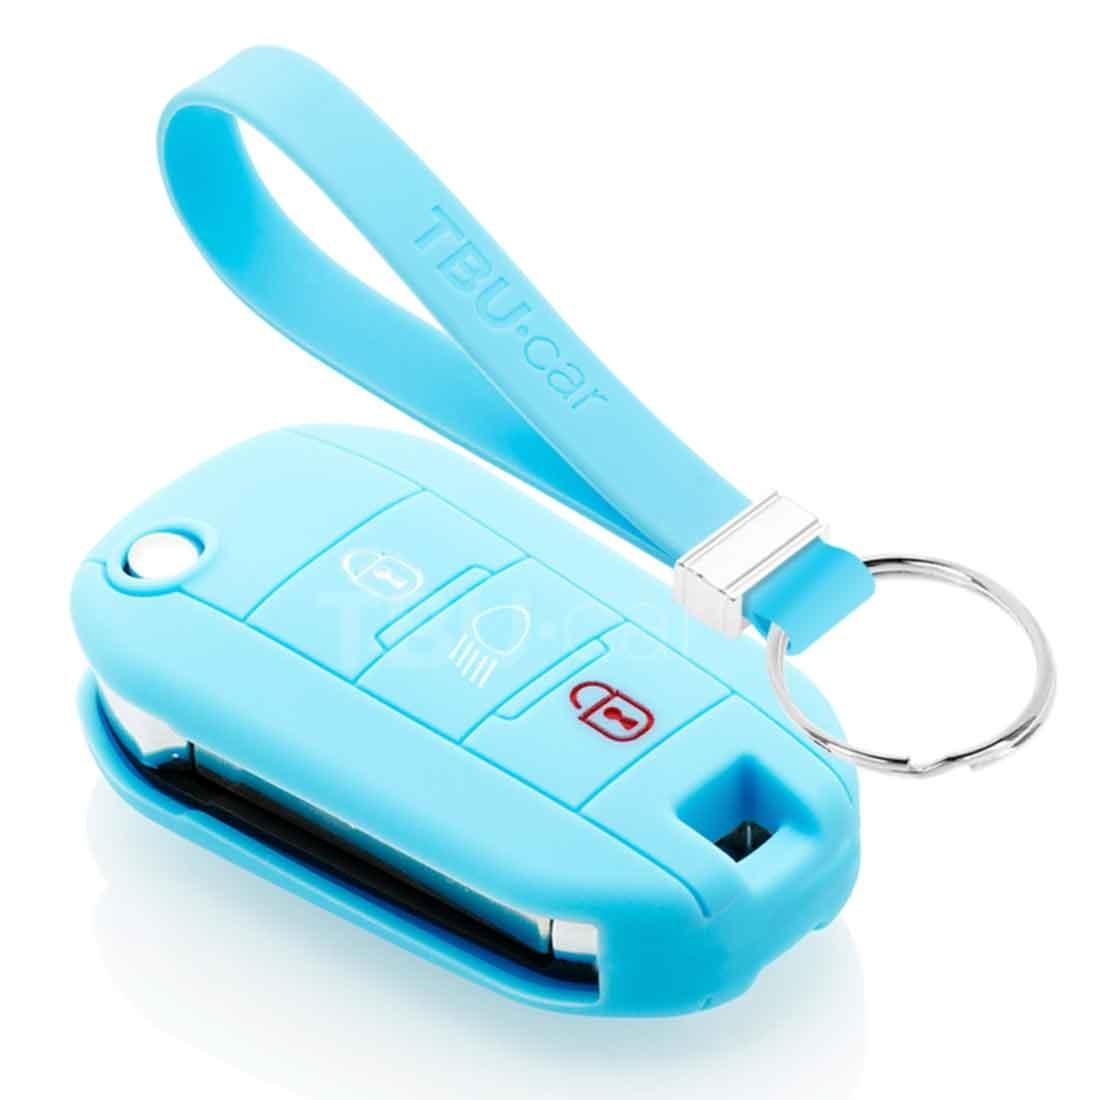 TBU car TBU car Funda Carcasa llave compatible con Citroën - Funda de Silicona - Cover de Llave Coche - Azul claro